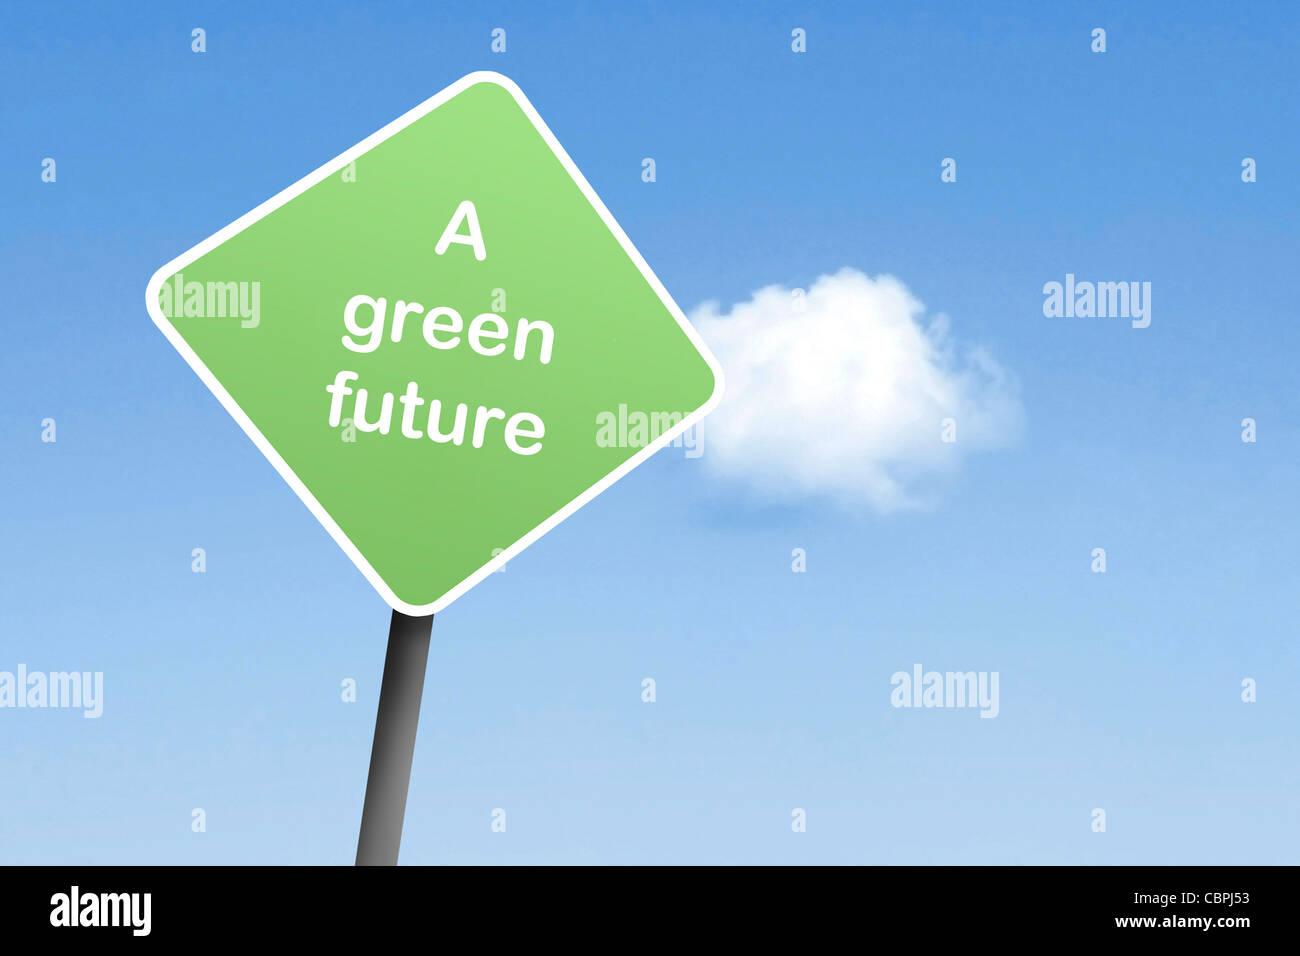 A greener future - Stock Image